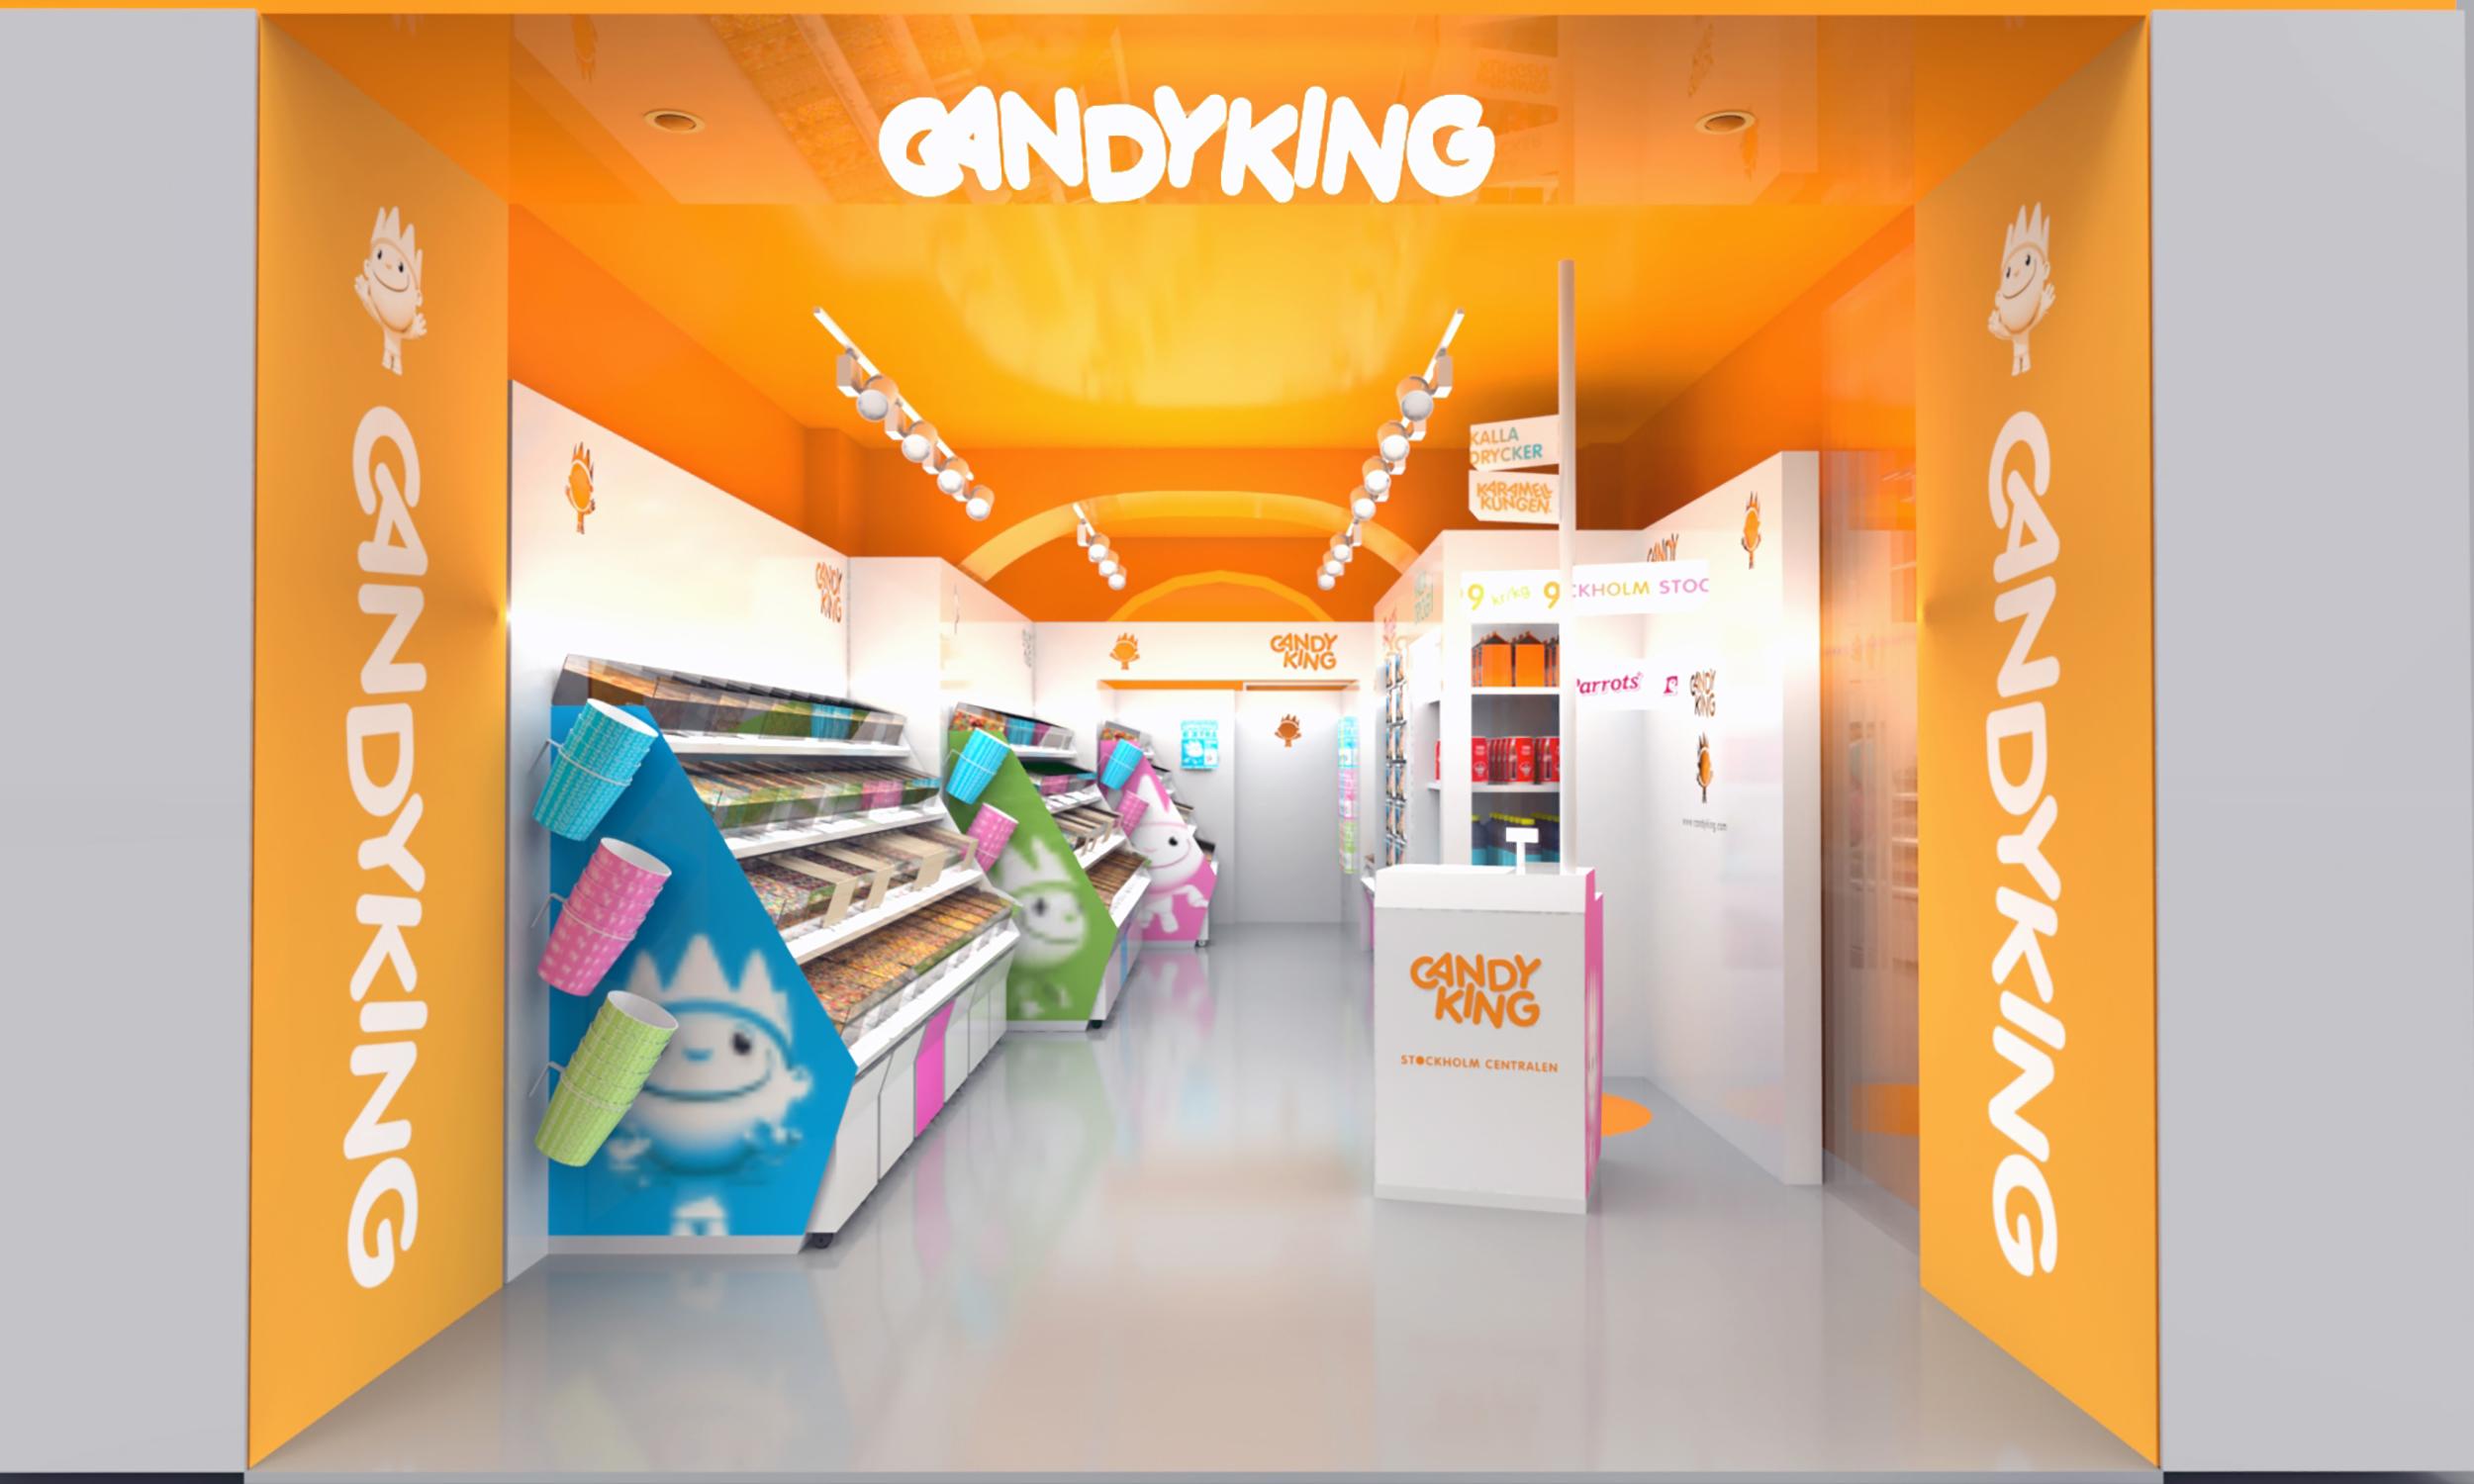 Candyking_Stockholm_sergiomonterobravo_5